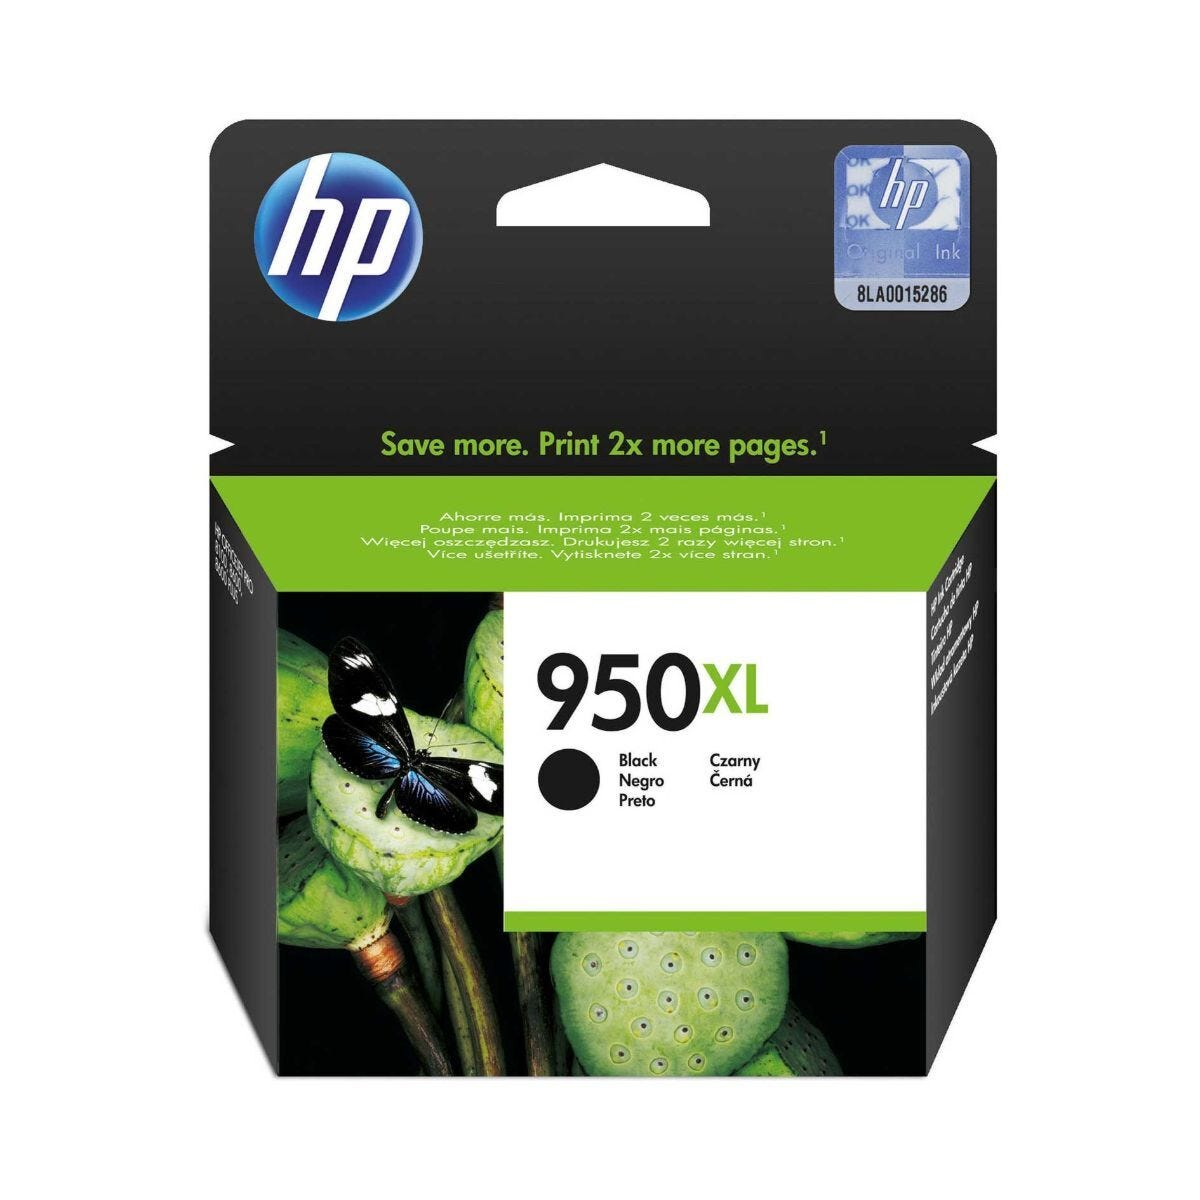 HP 950XL Inkjet Cartridge CN045AE